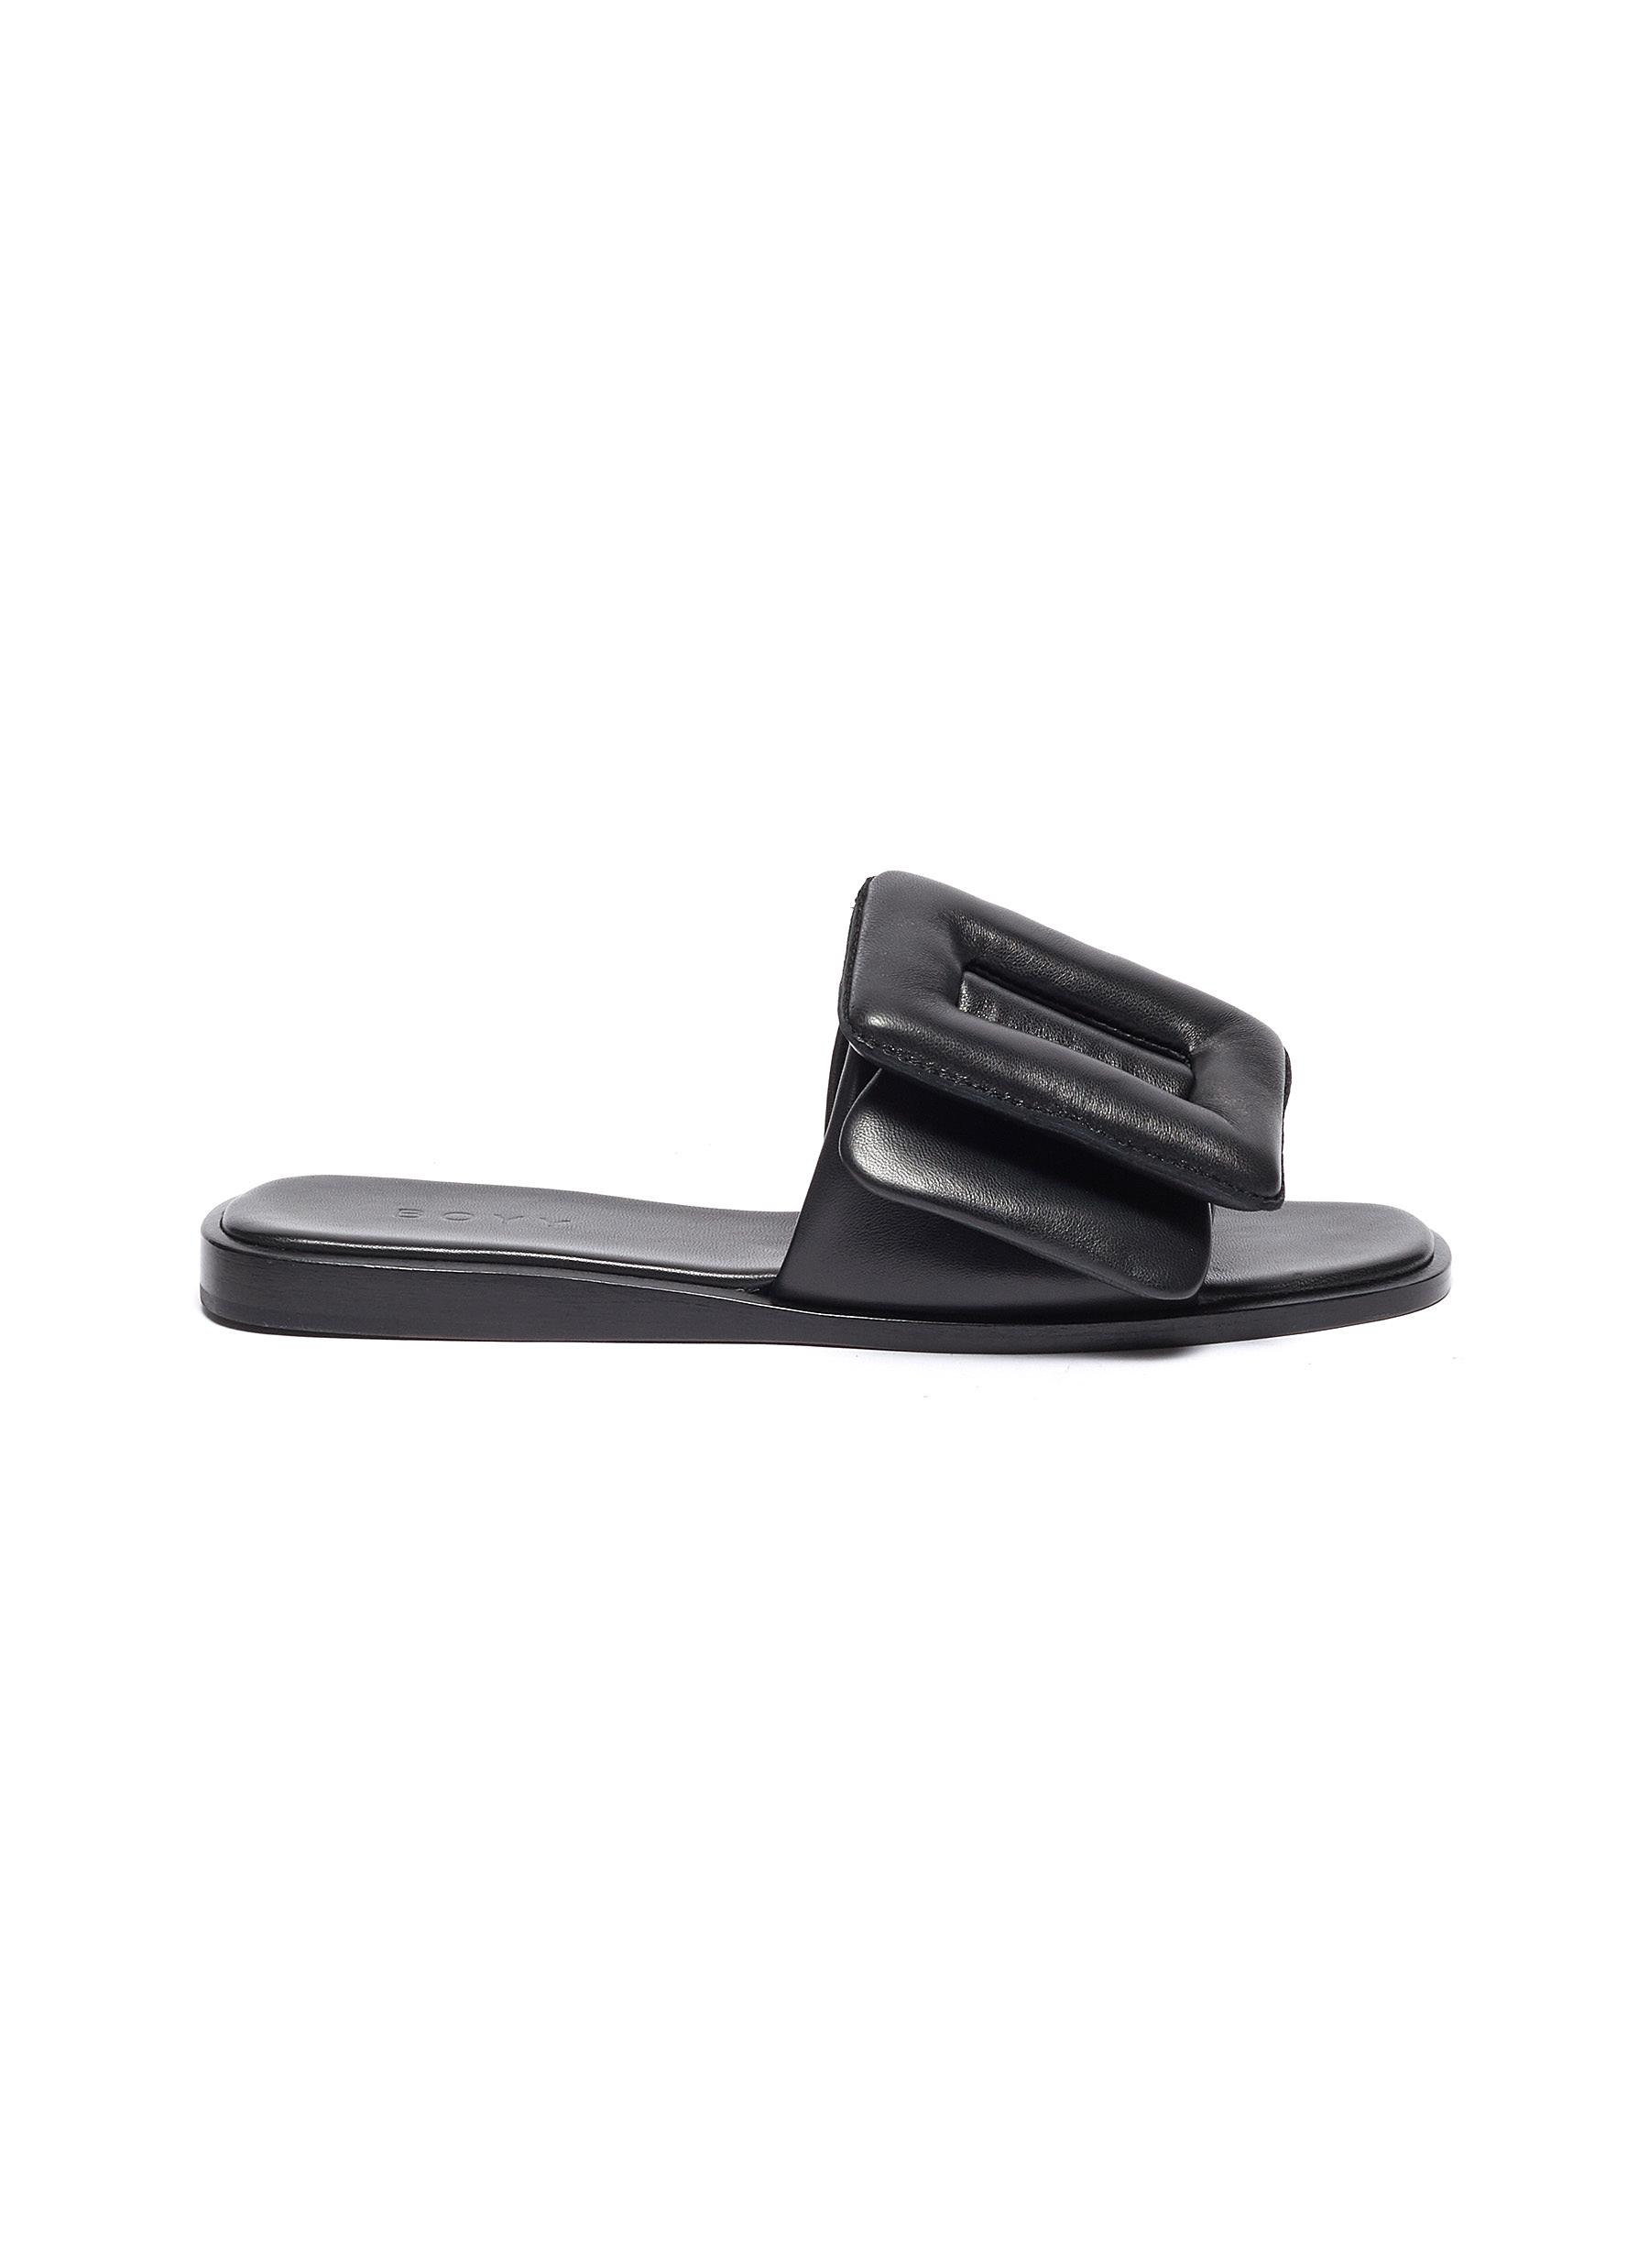 Boyy Flats Buckle single band leather sandals